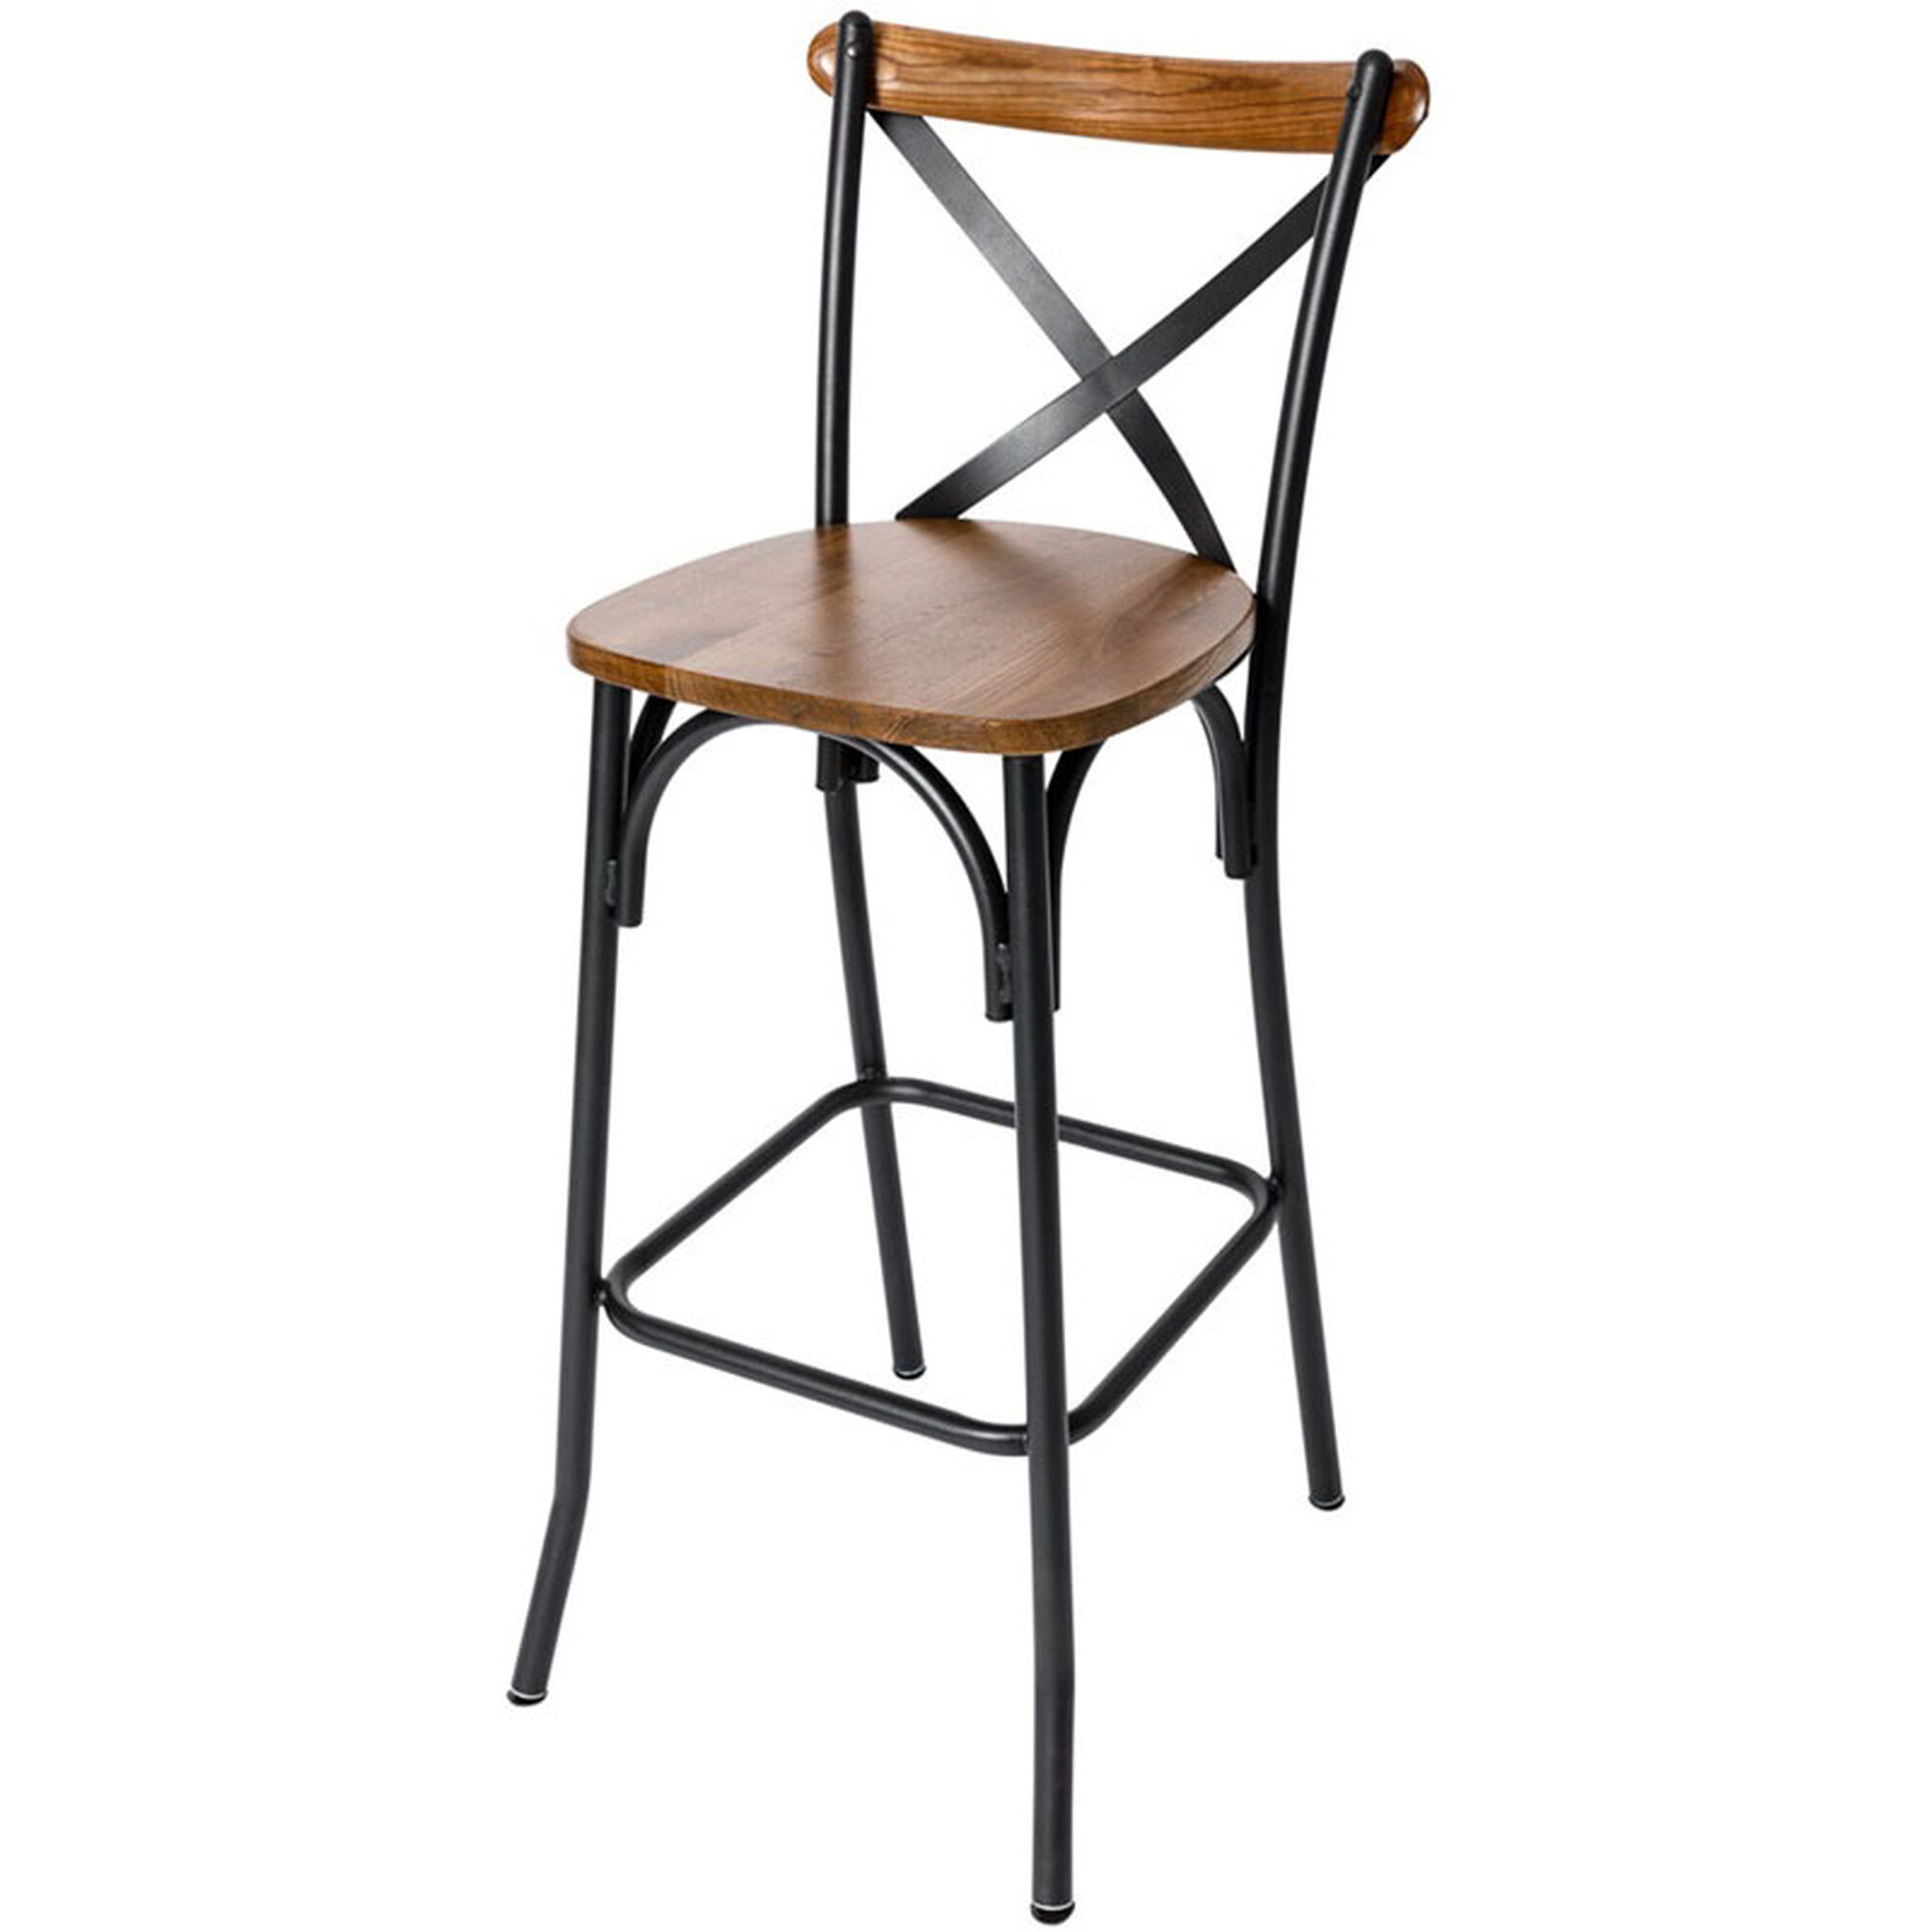 Superb Henry Black Metal Cross Back Barstool Autumn Ash Wood Seat Spiritservingveterans Wood Chair Design Ideas Spiritservingveteransorg